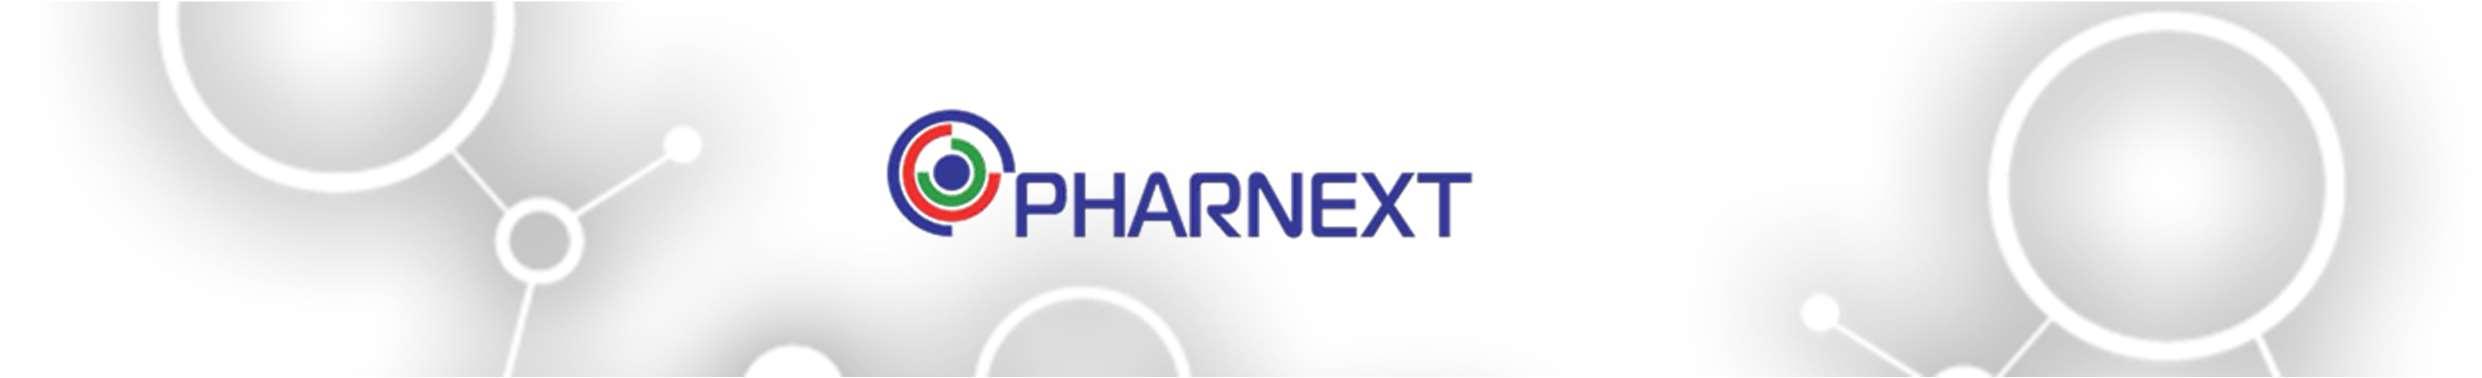 Pharnext